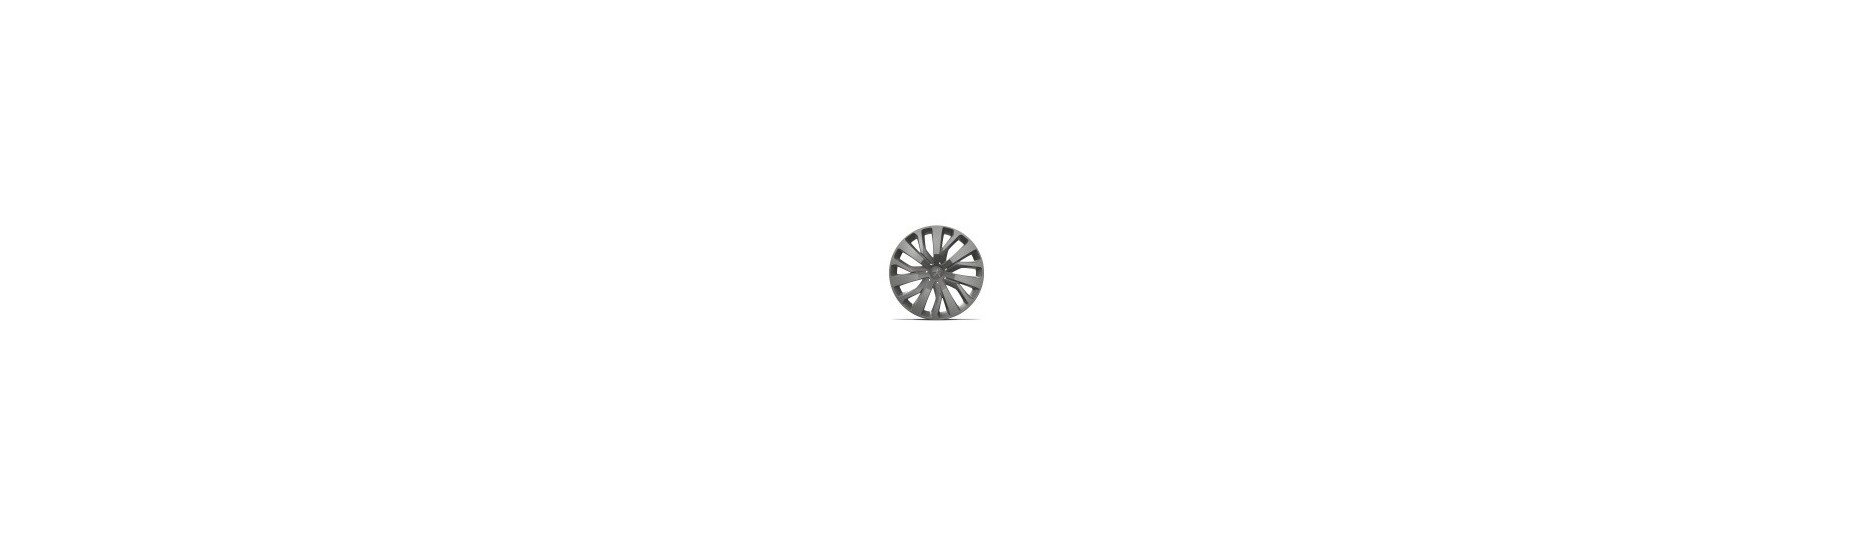 Wheel trims Peugeot